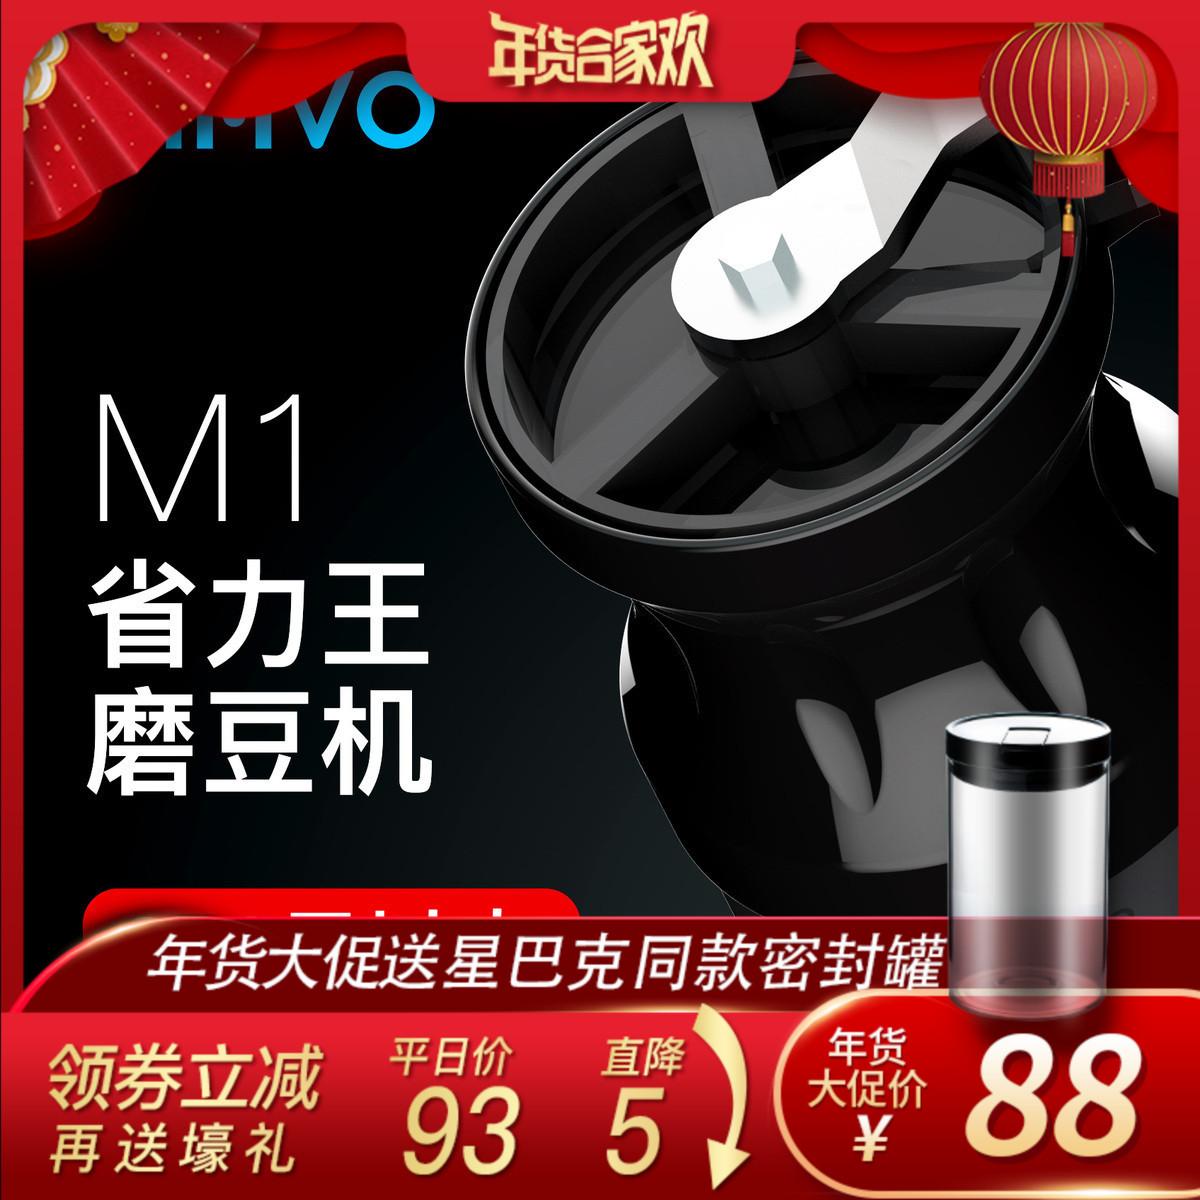 Mavo磨豆機 手搖手動咖啡豆研磨機 磨粉器咖啡機 全身水洗粉碎機